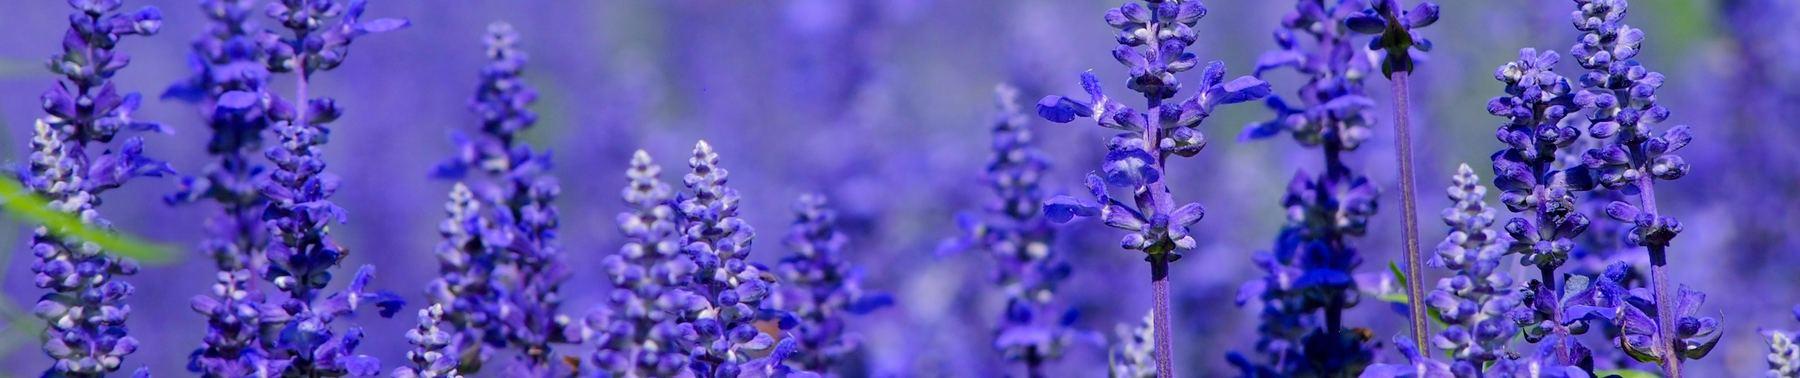 Iris Flower Dataset | Kaggle